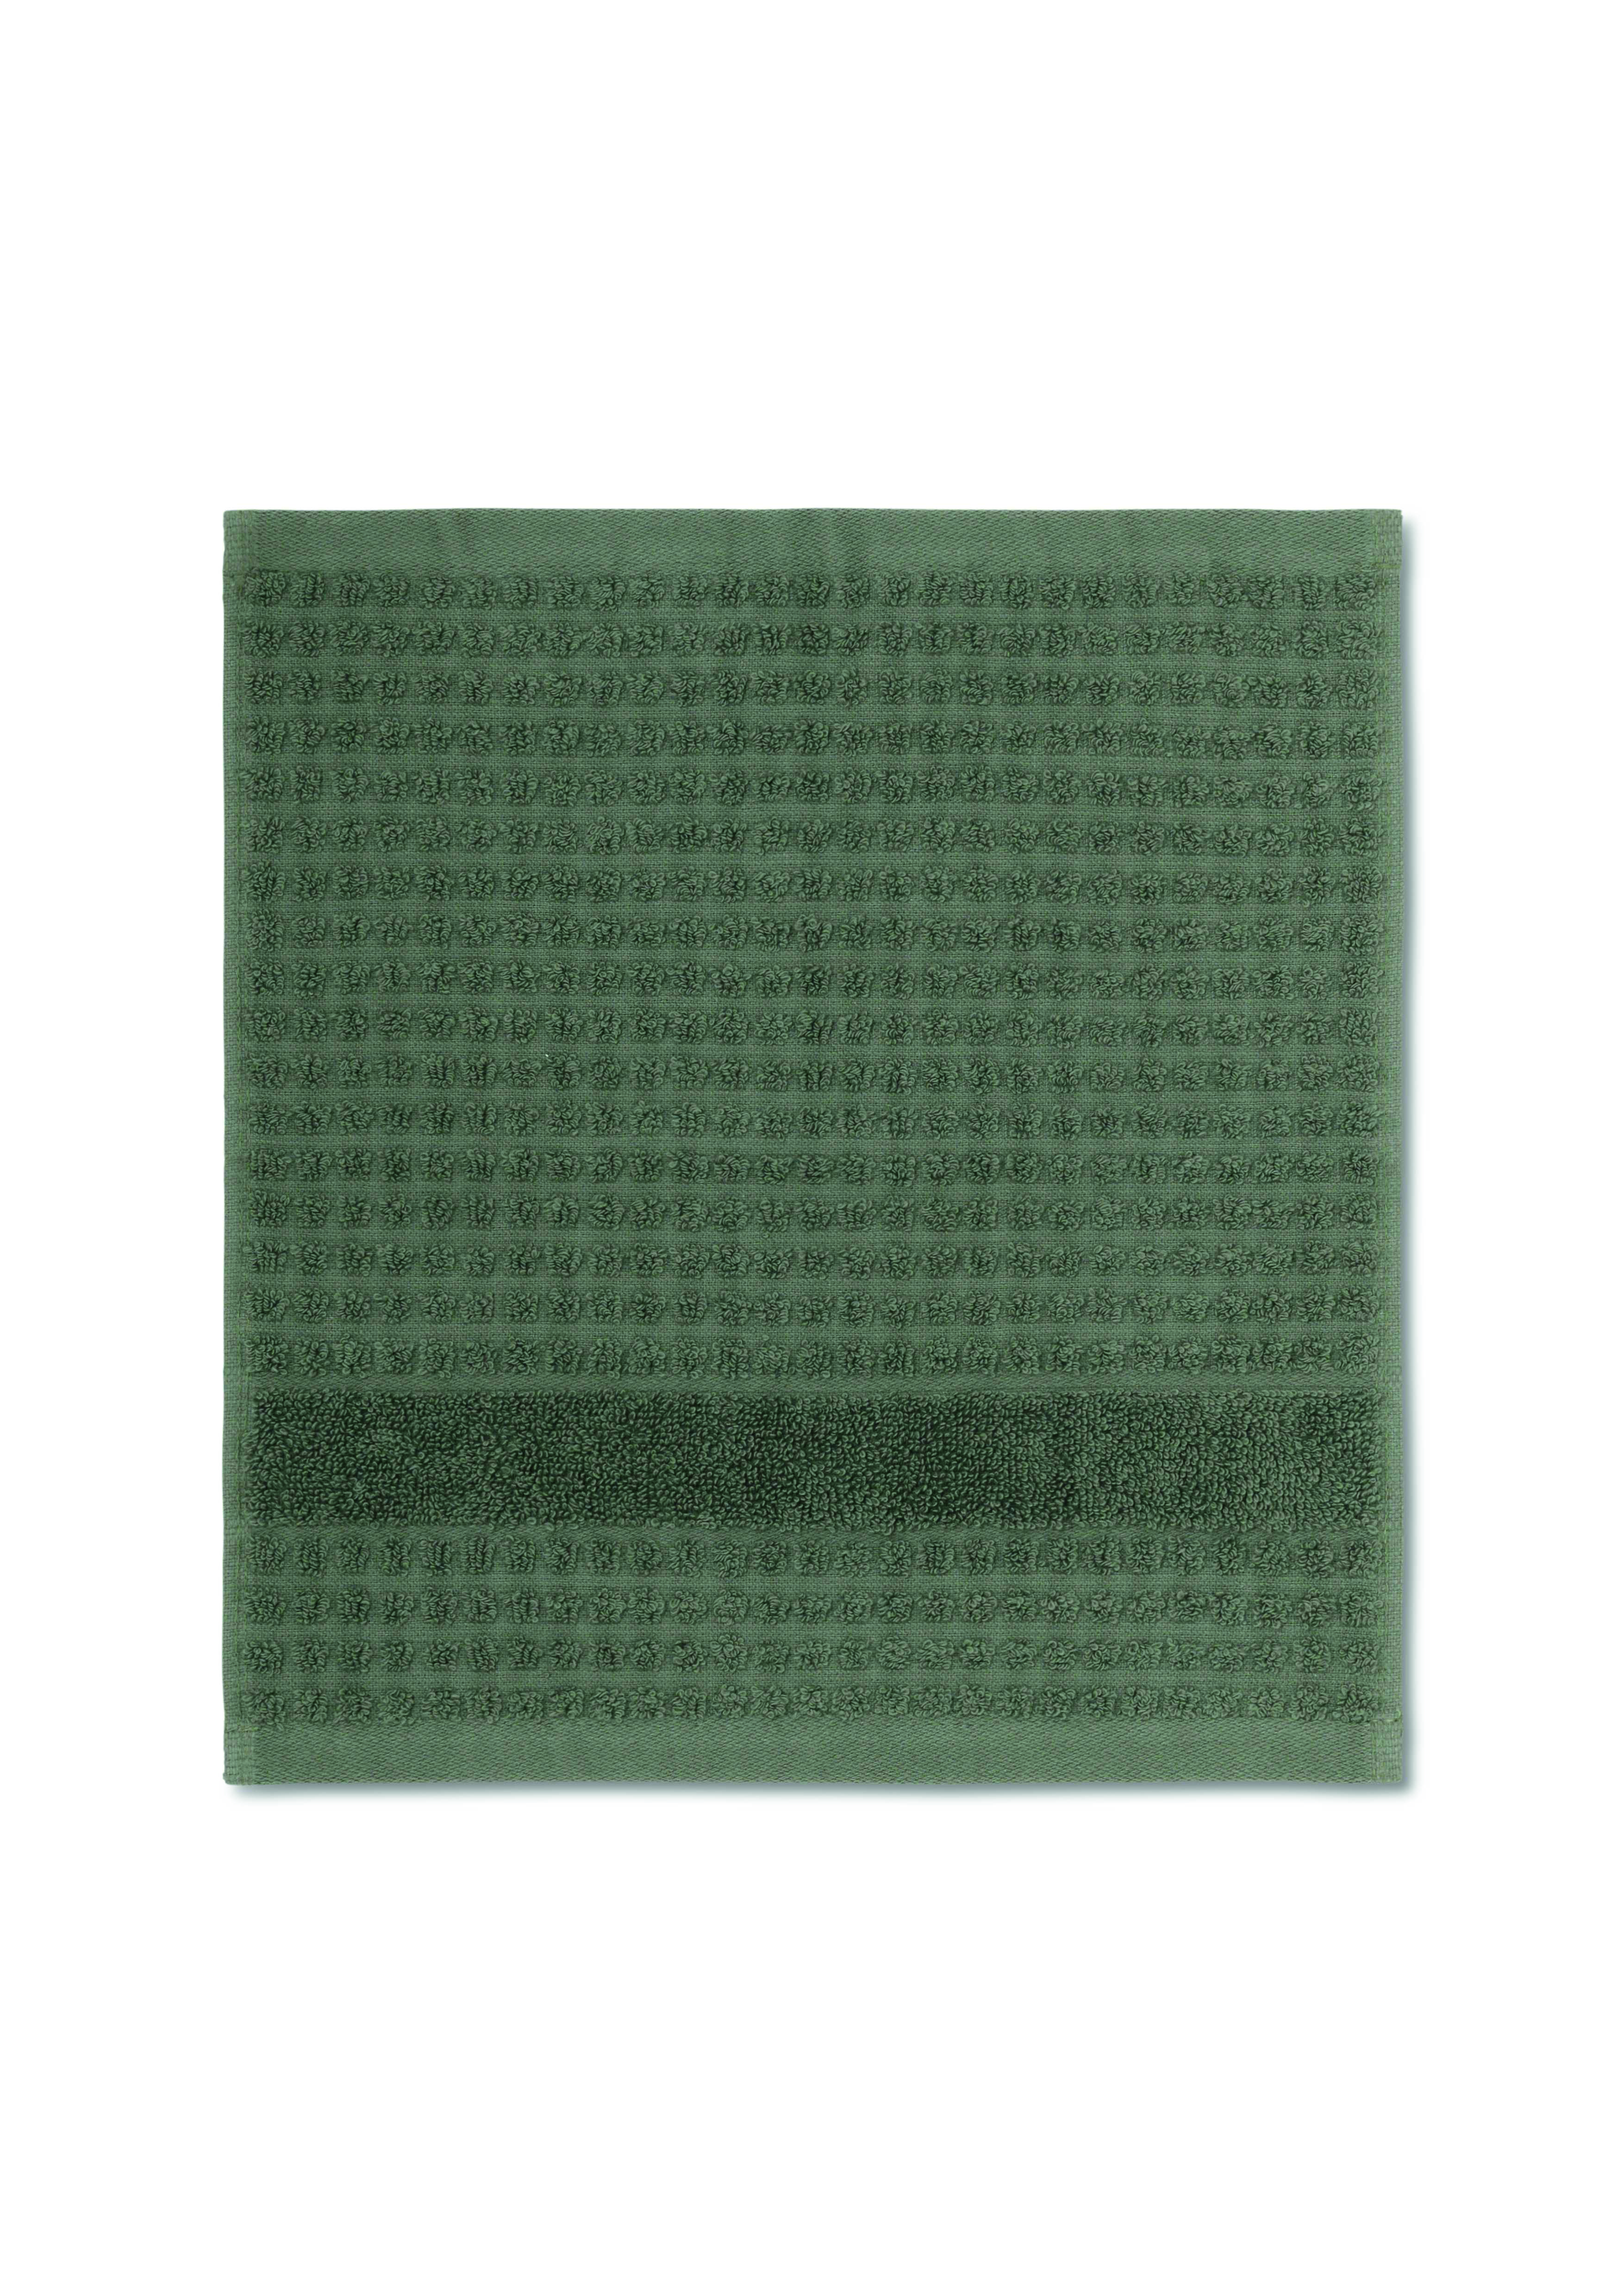 Juna Check vaskeklud, 30x30 cm, mørkegrøn